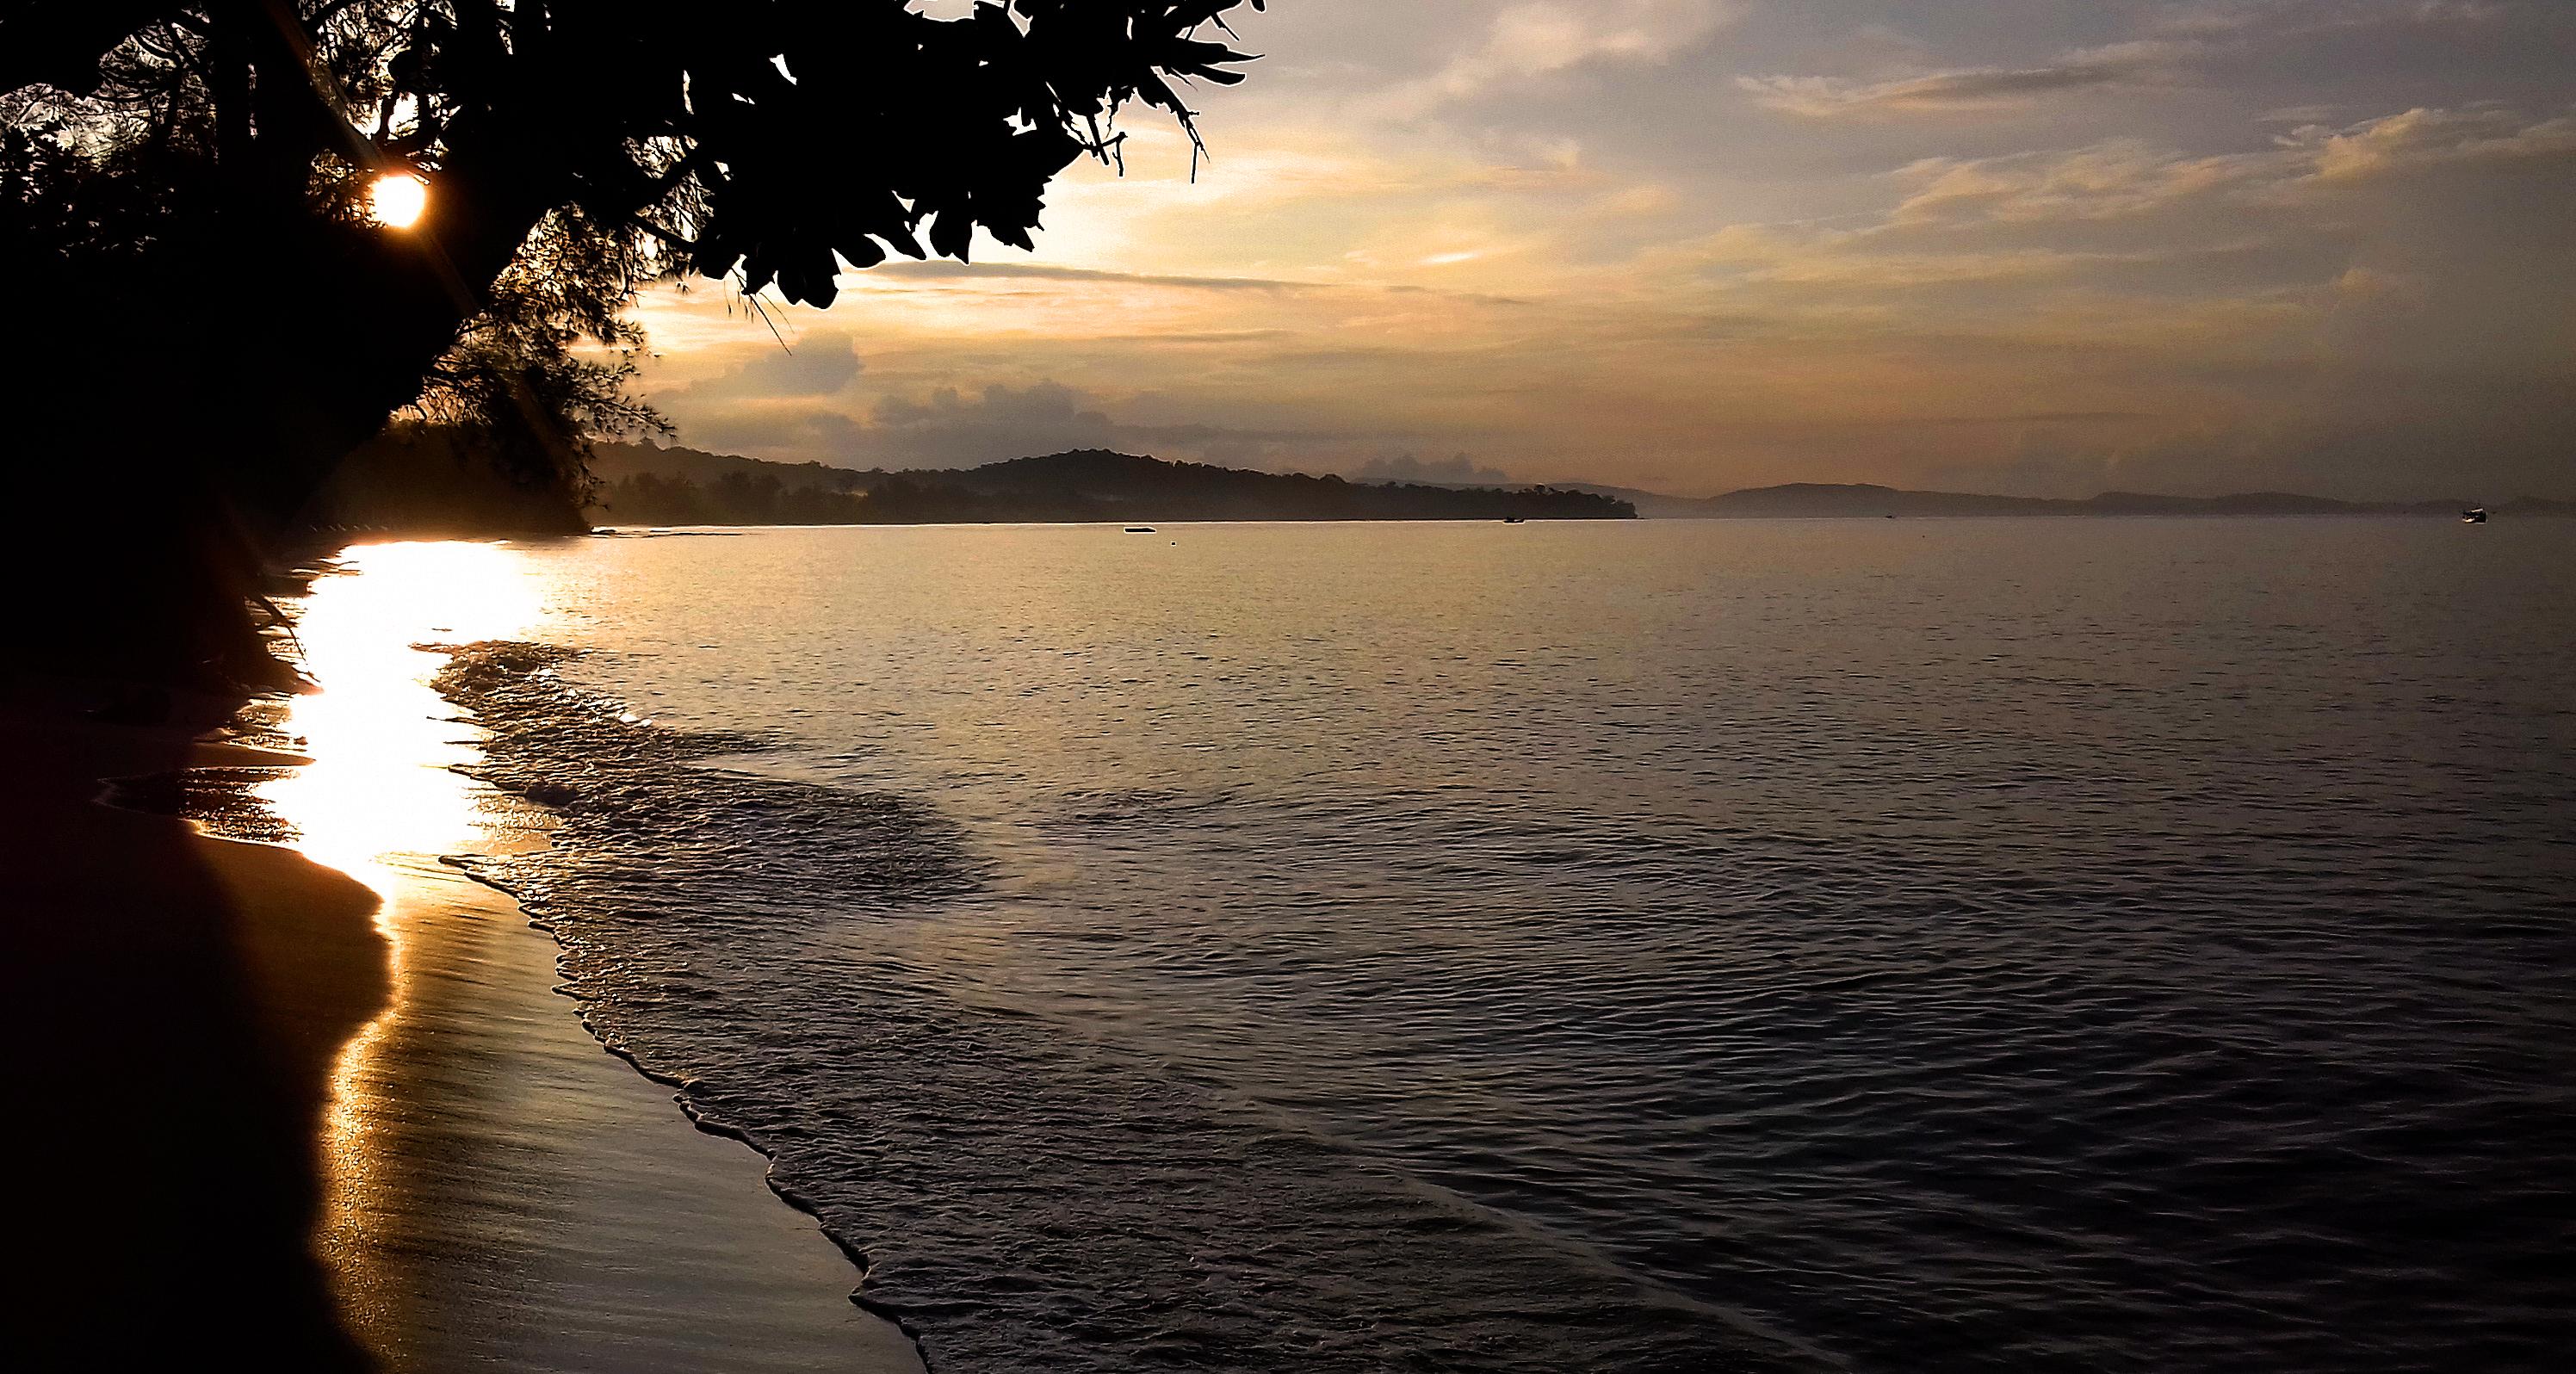 Gold Sand Beach Bungalow Sunrise 3